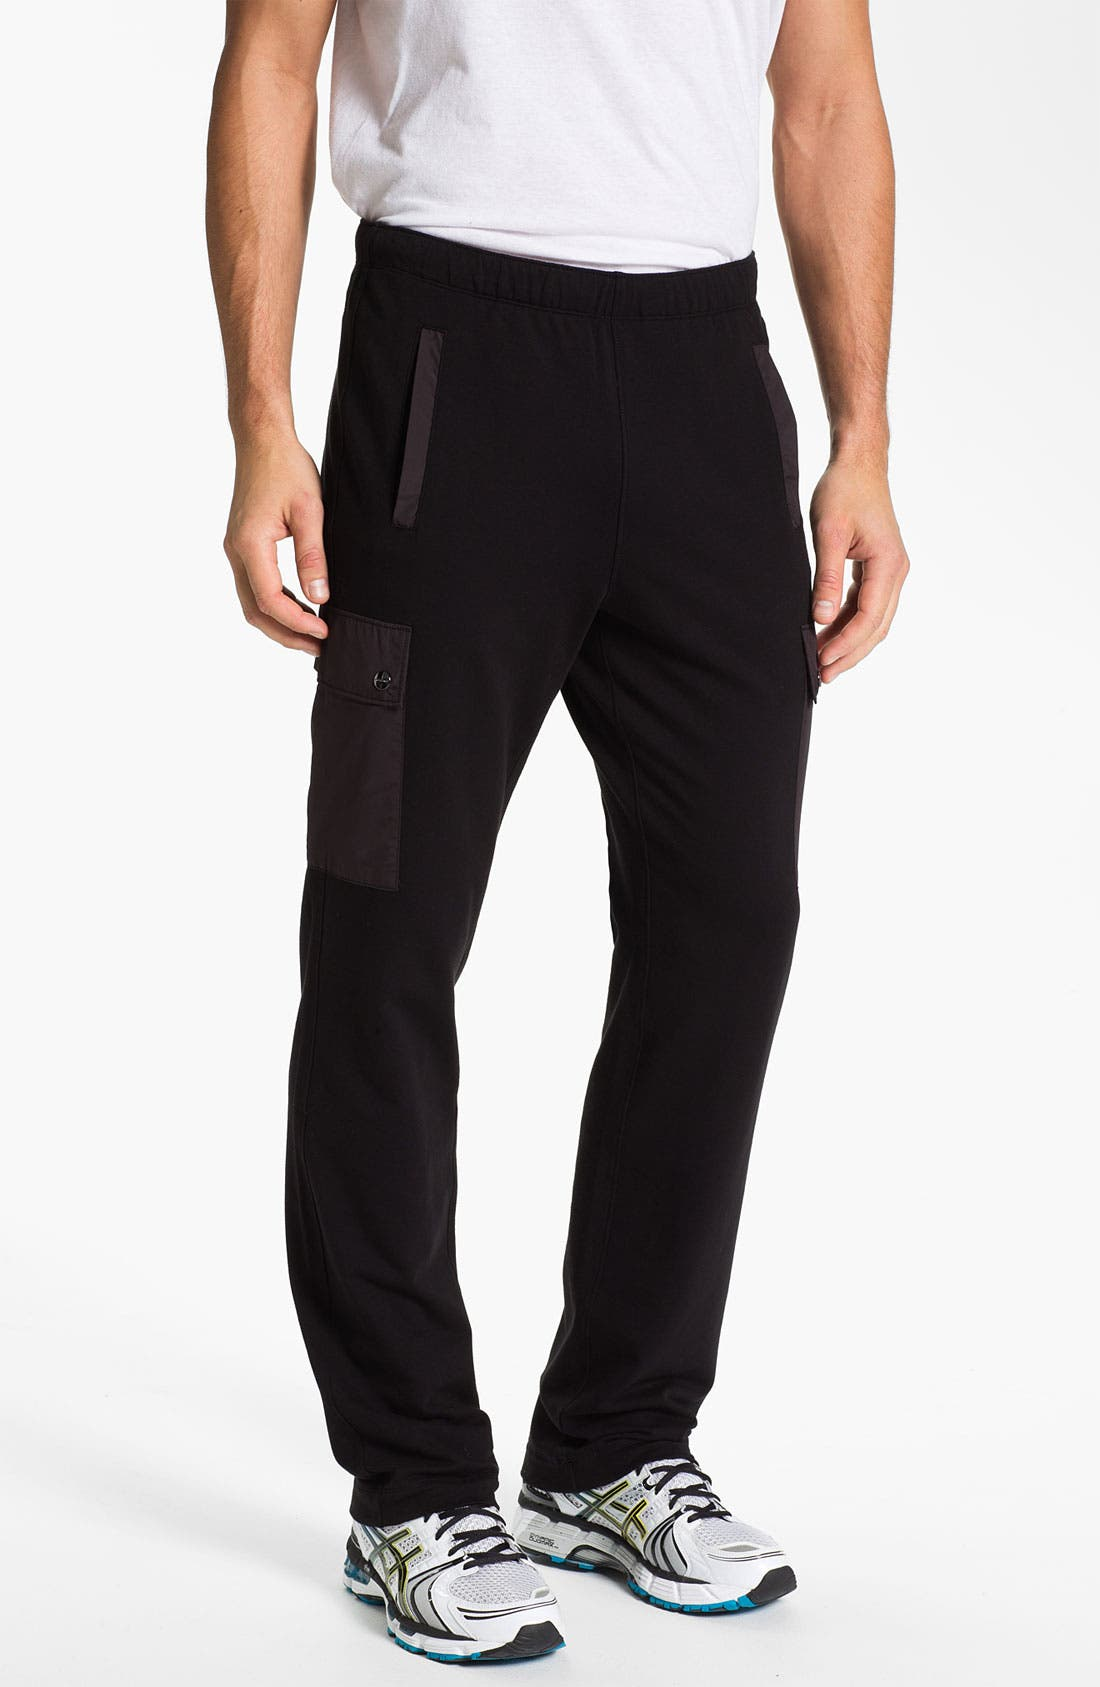 Alternate Image 1 Selected - Michael Kors Fleece Cargo Pants